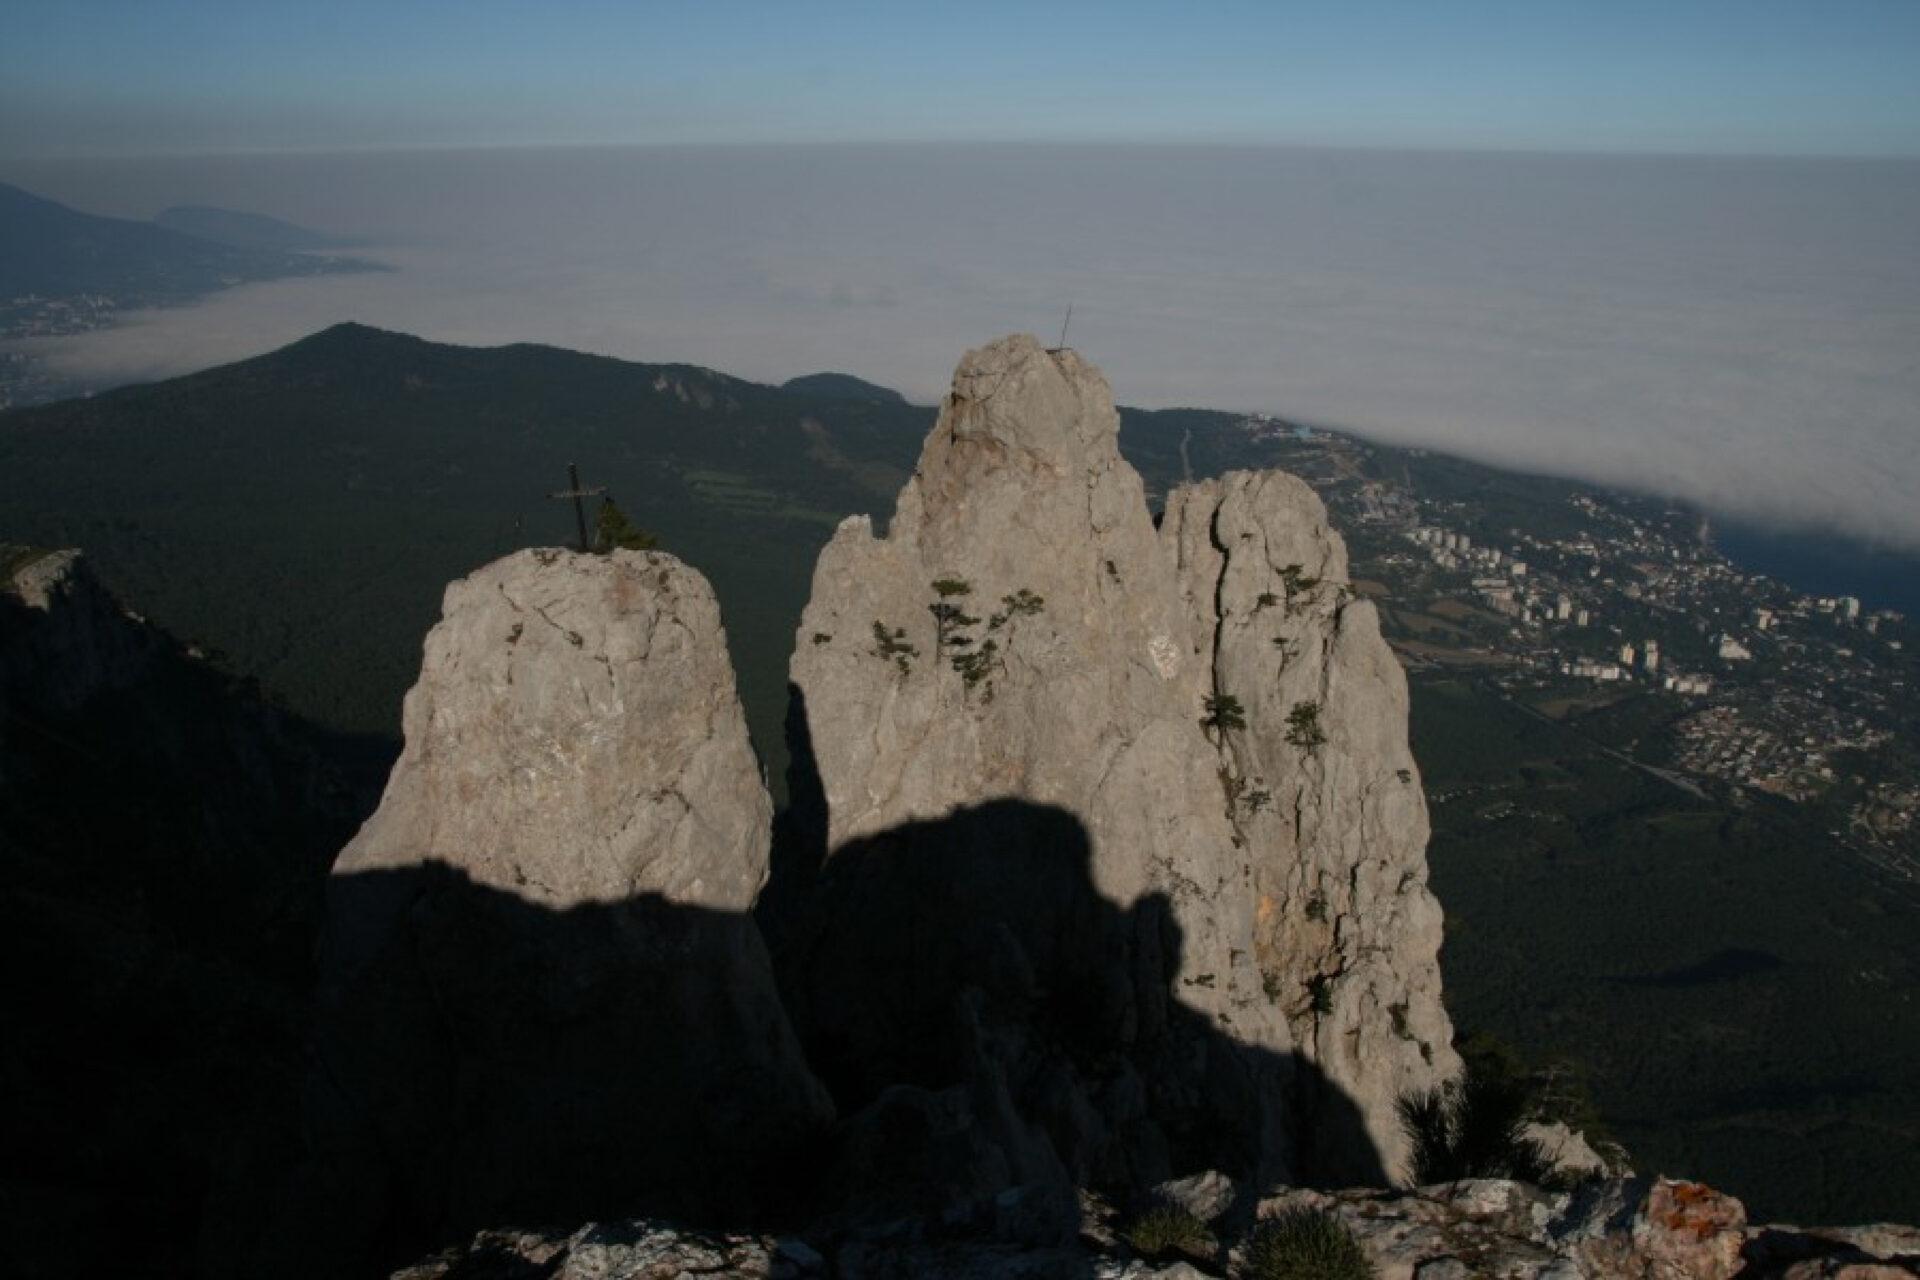 Прогулка нагору Ай-Петри близ Ялты